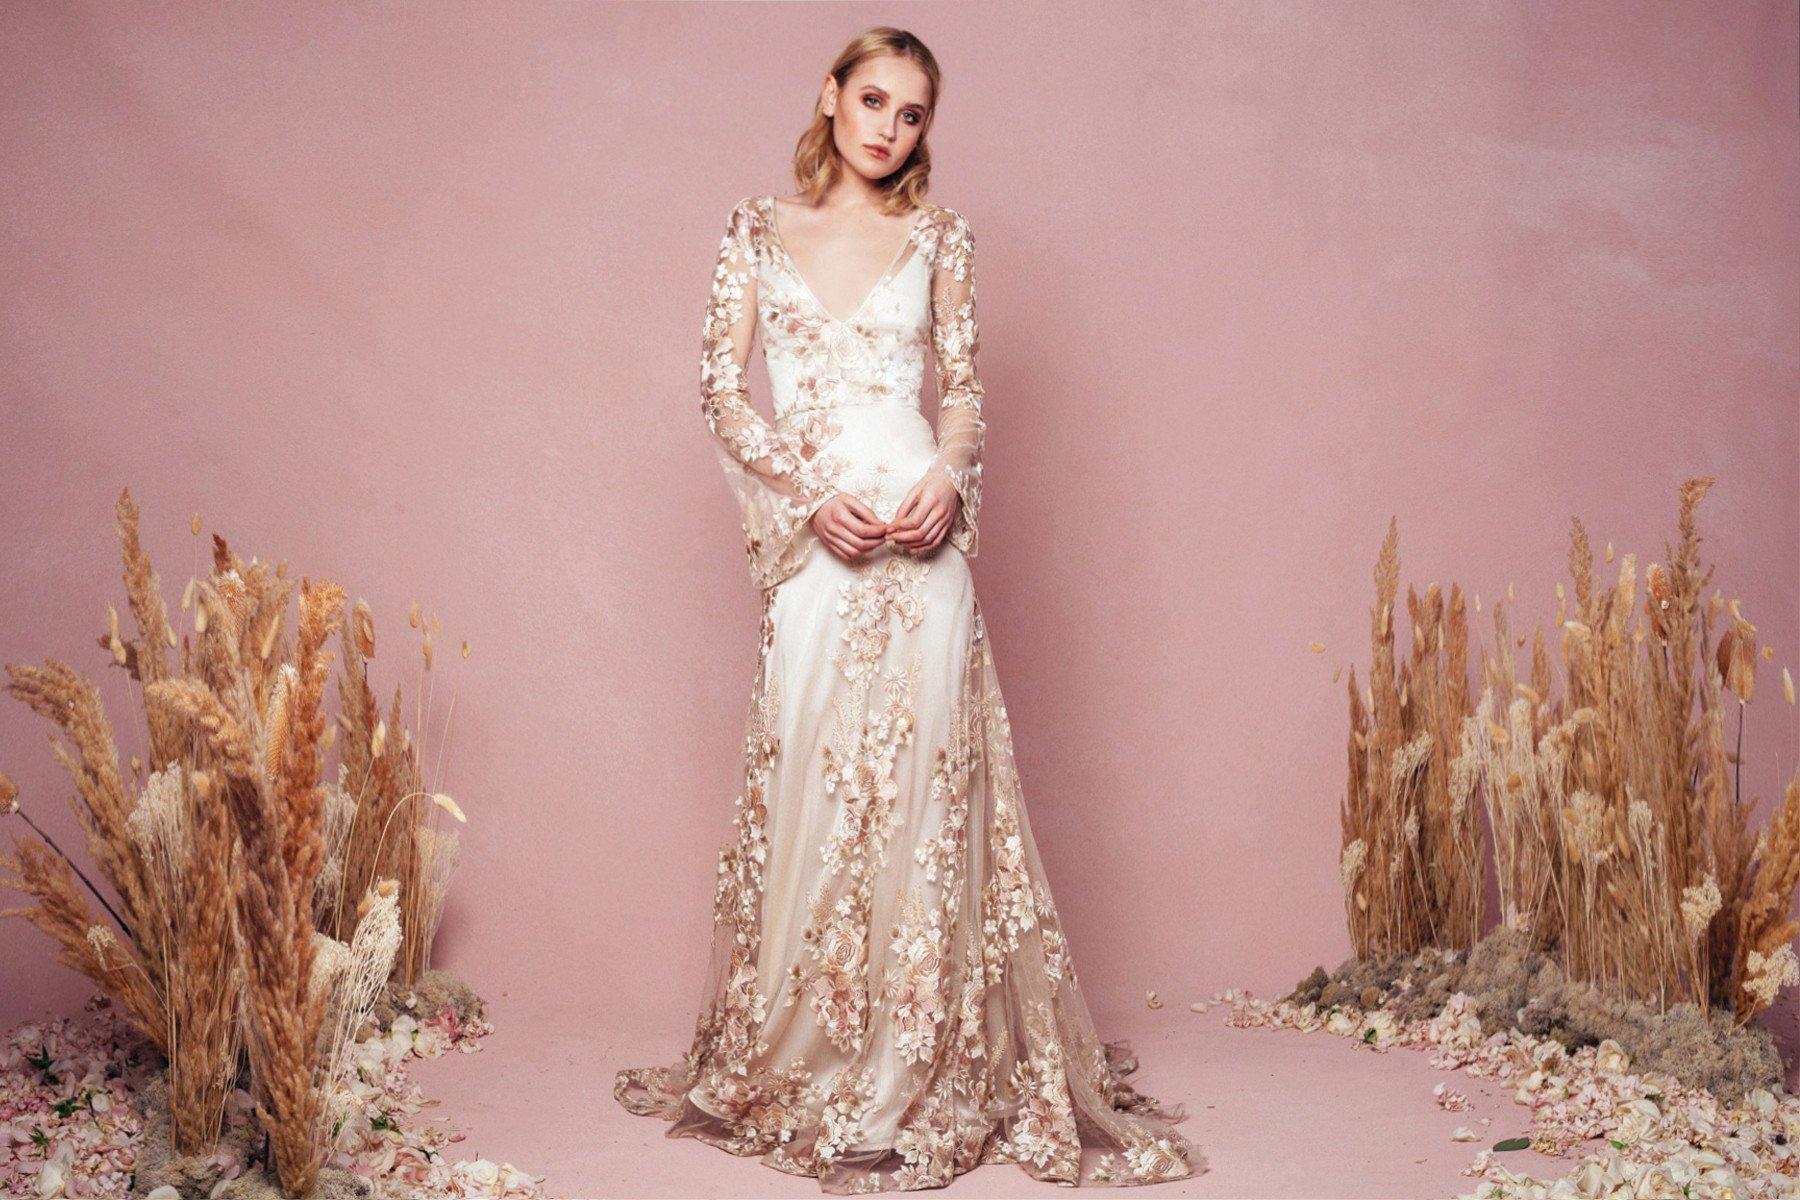 Wedding Dress Shopping: My Dream Dresses | Odylyne the Ceremony | Wolf & Stag